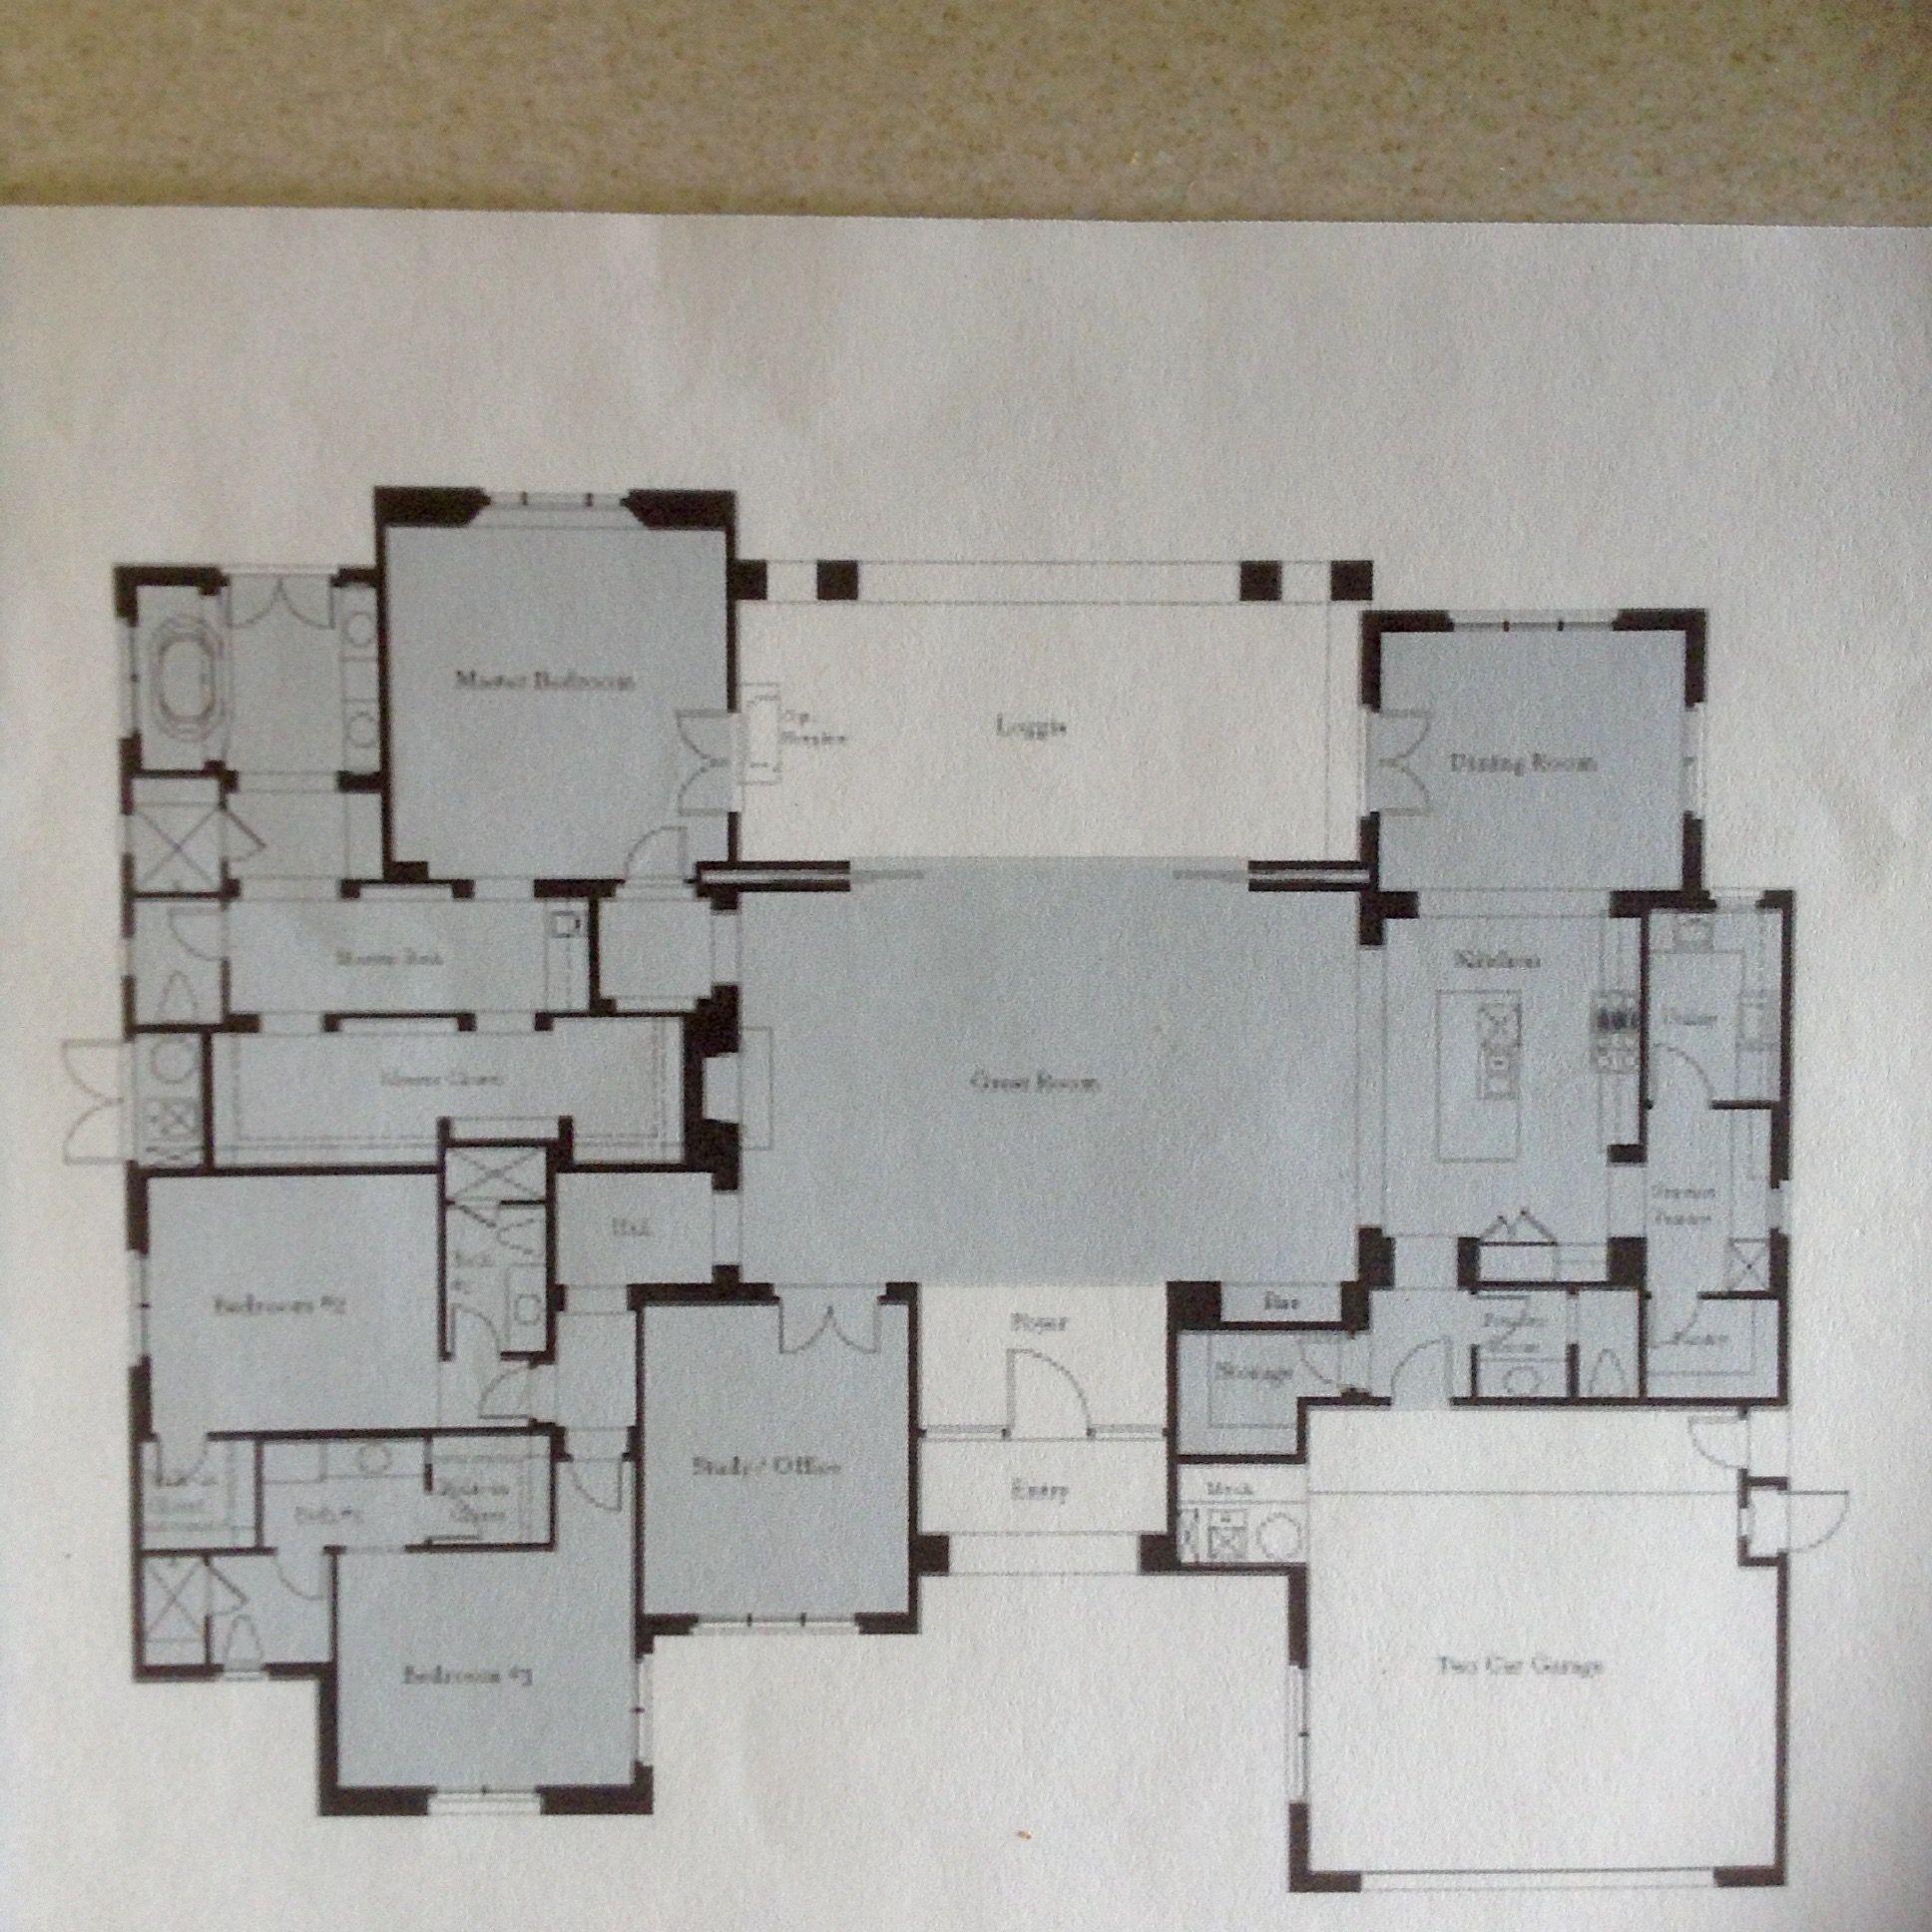 Casitas 3 Silverleaf Scottsdale Az Floor Plans How To Plan Scottsdale